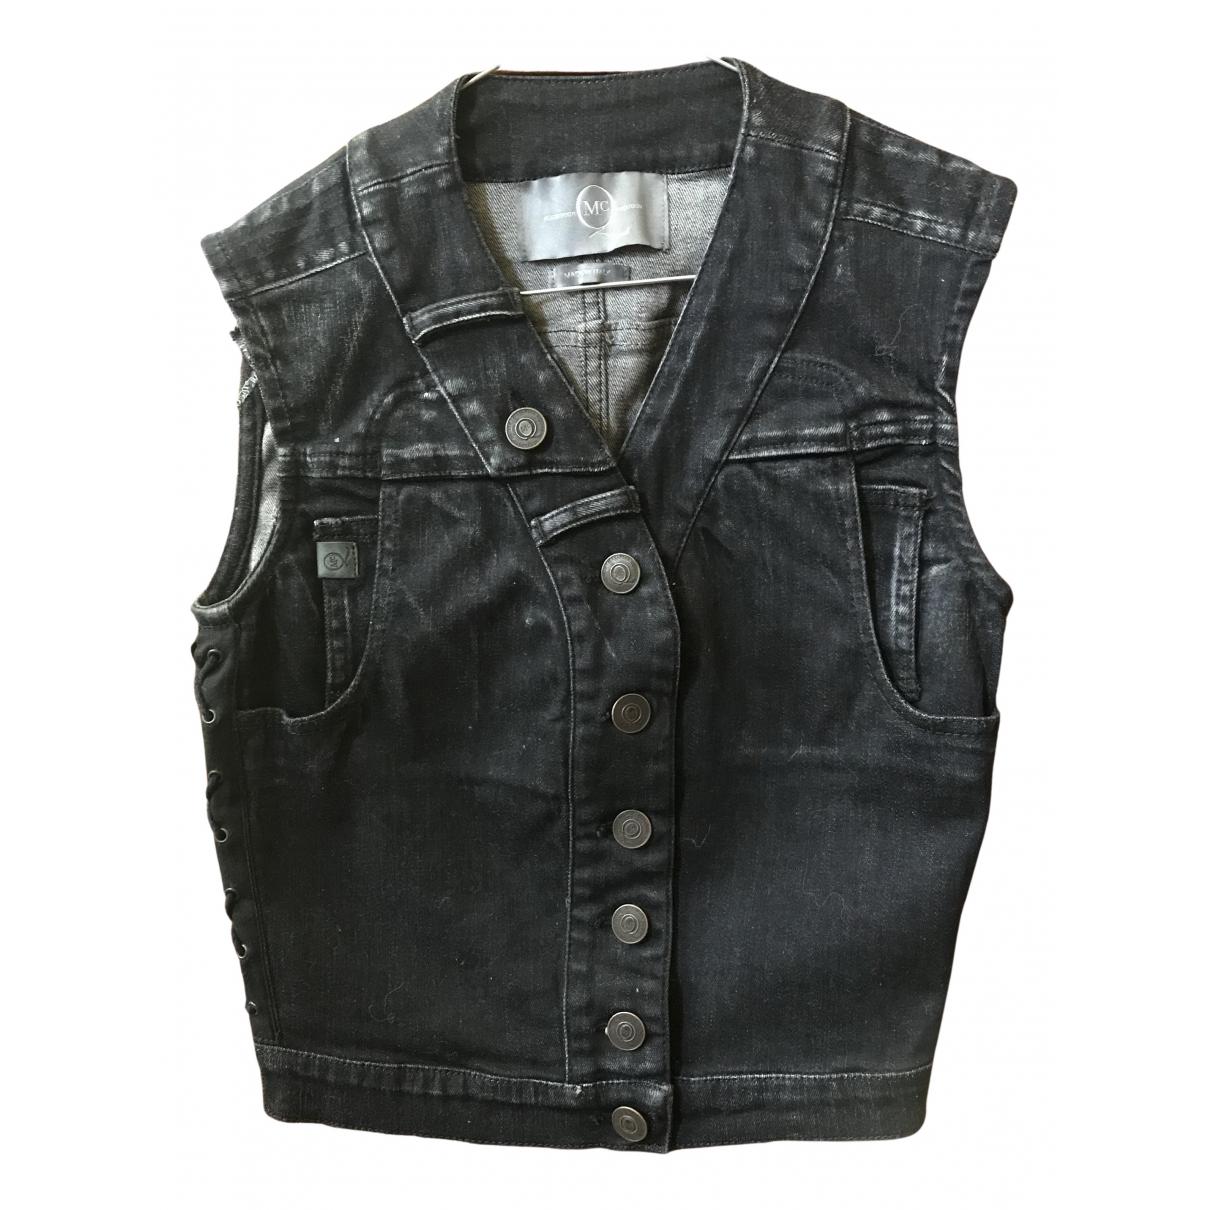 Mcq N Black Denim - Jeans jacket for Women 38 IT